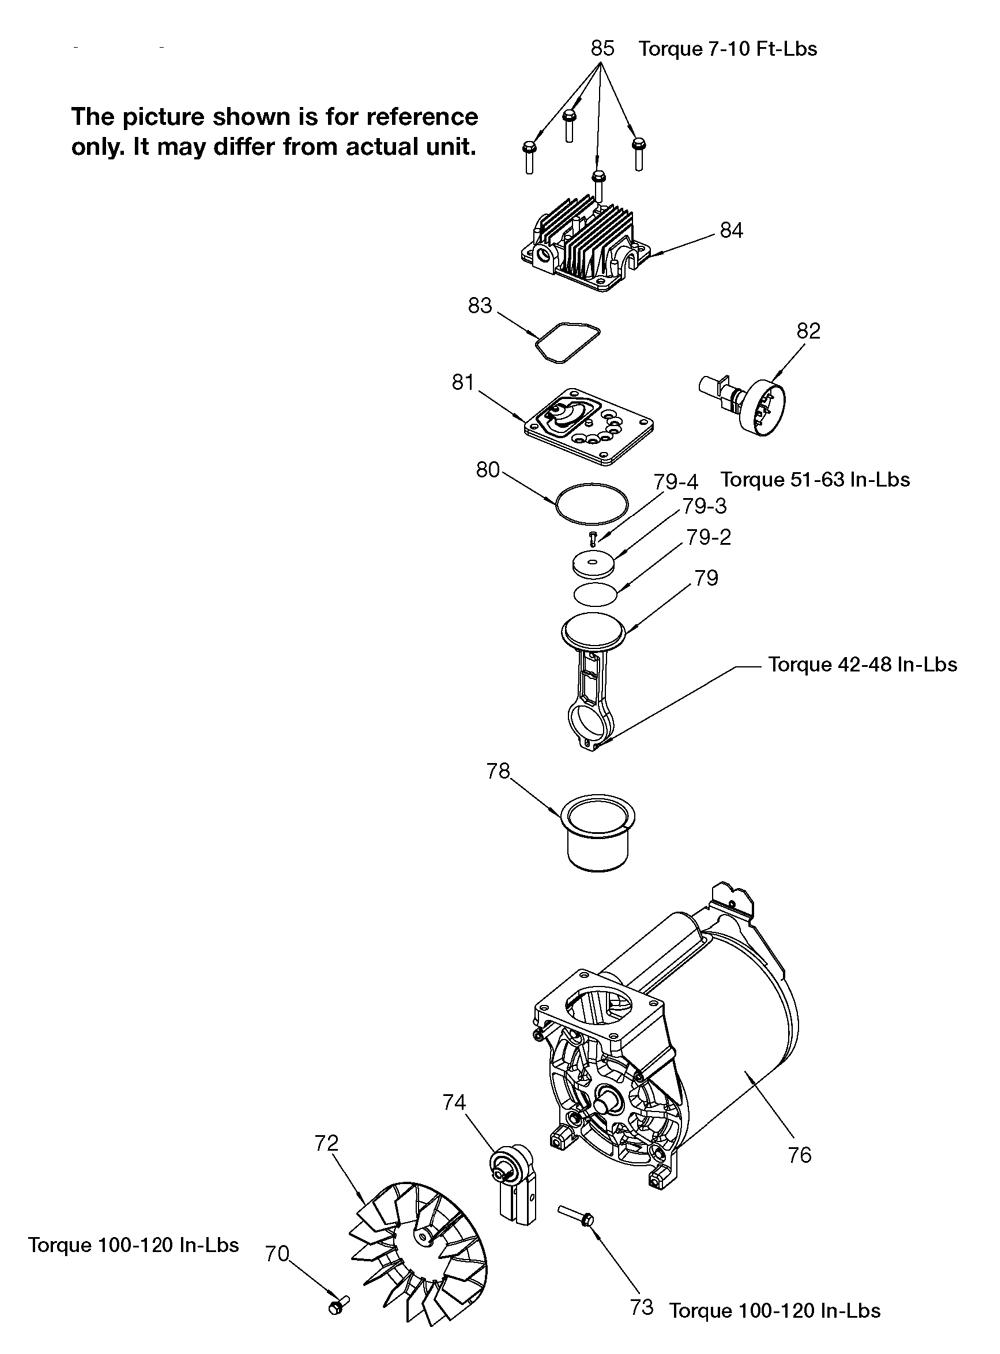 919-16551-Devilbiss-T1-PB-1Break Down